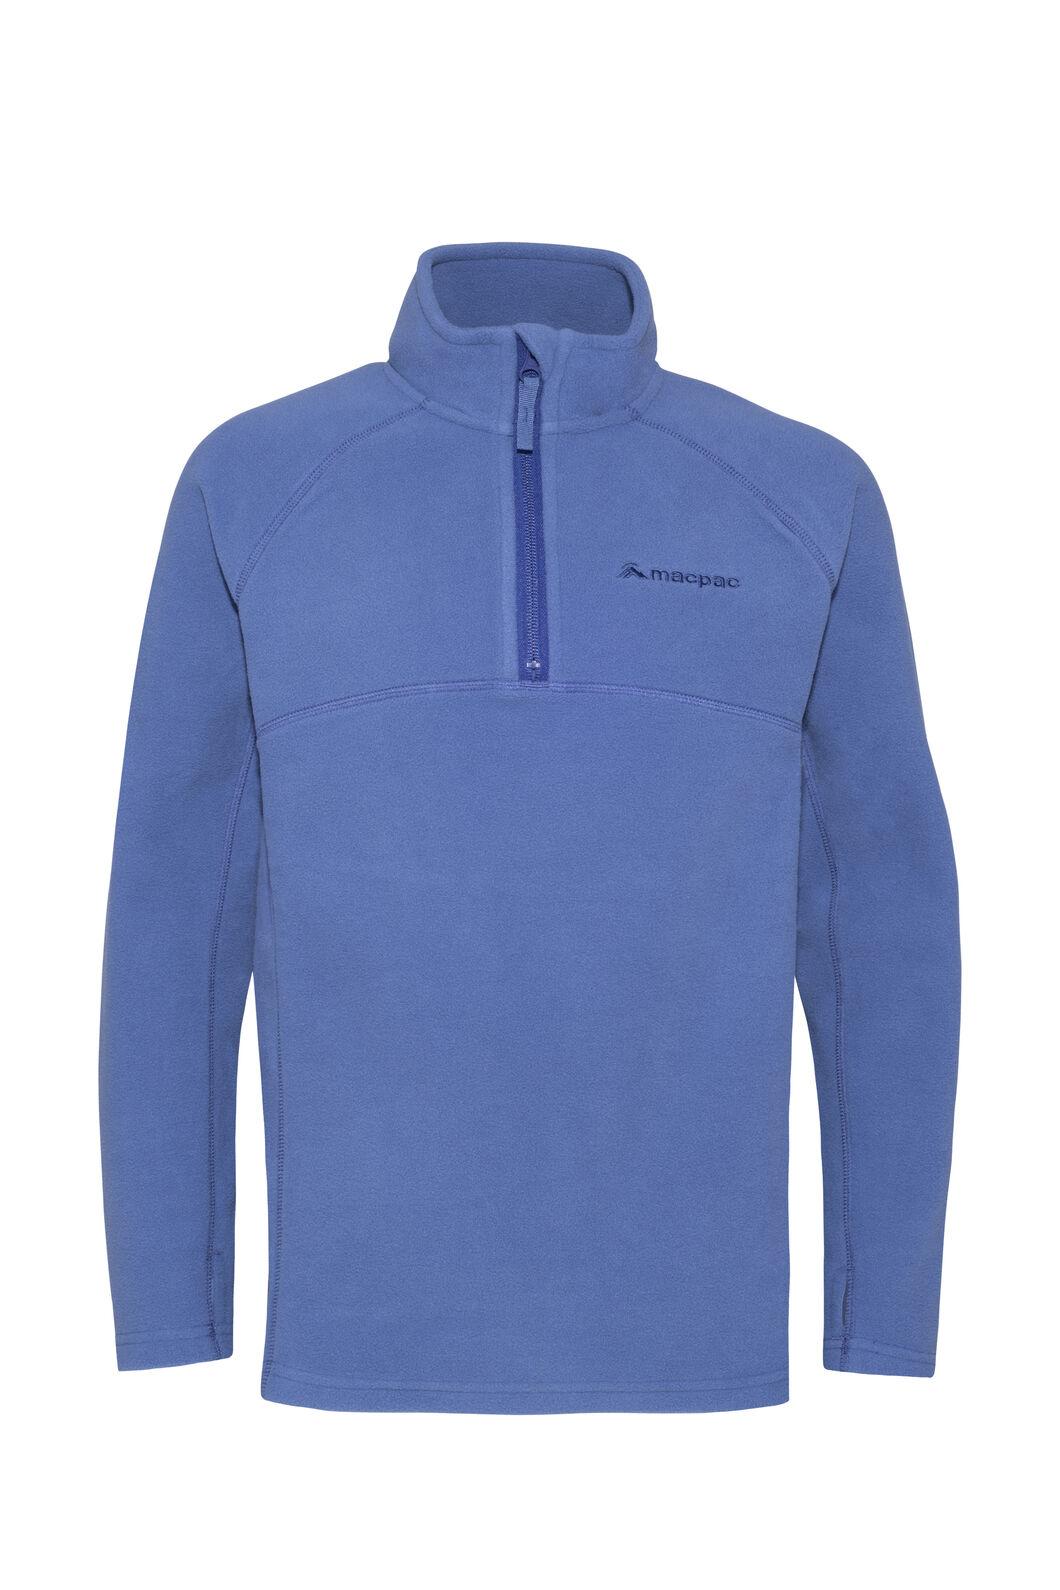 Macpac Tui Polartec® Fleece Pullover — Kids', True Navy, hi-res